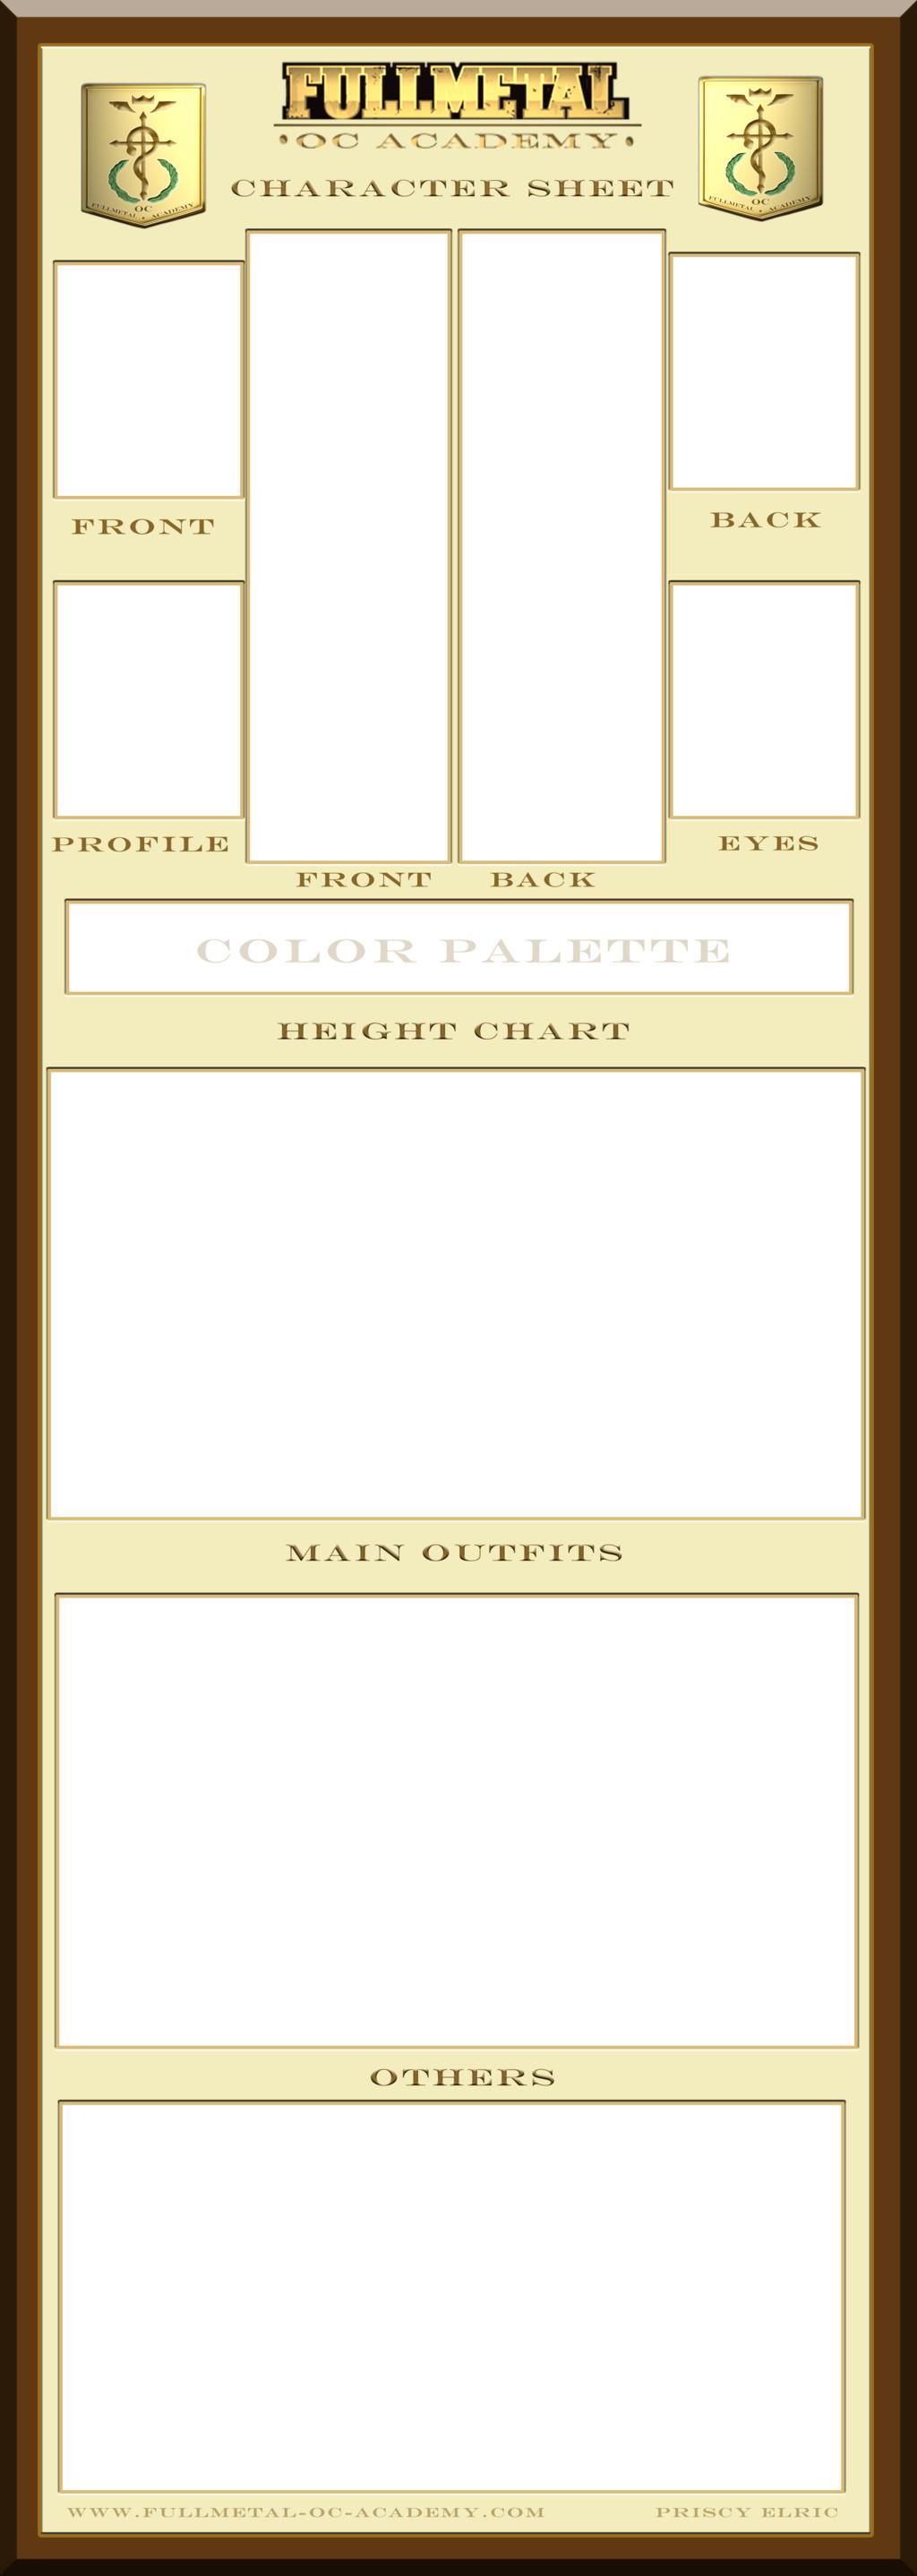 Oc Reference Sheet Template Fullmetal Oc Academy Character Sheet Template by Bitter